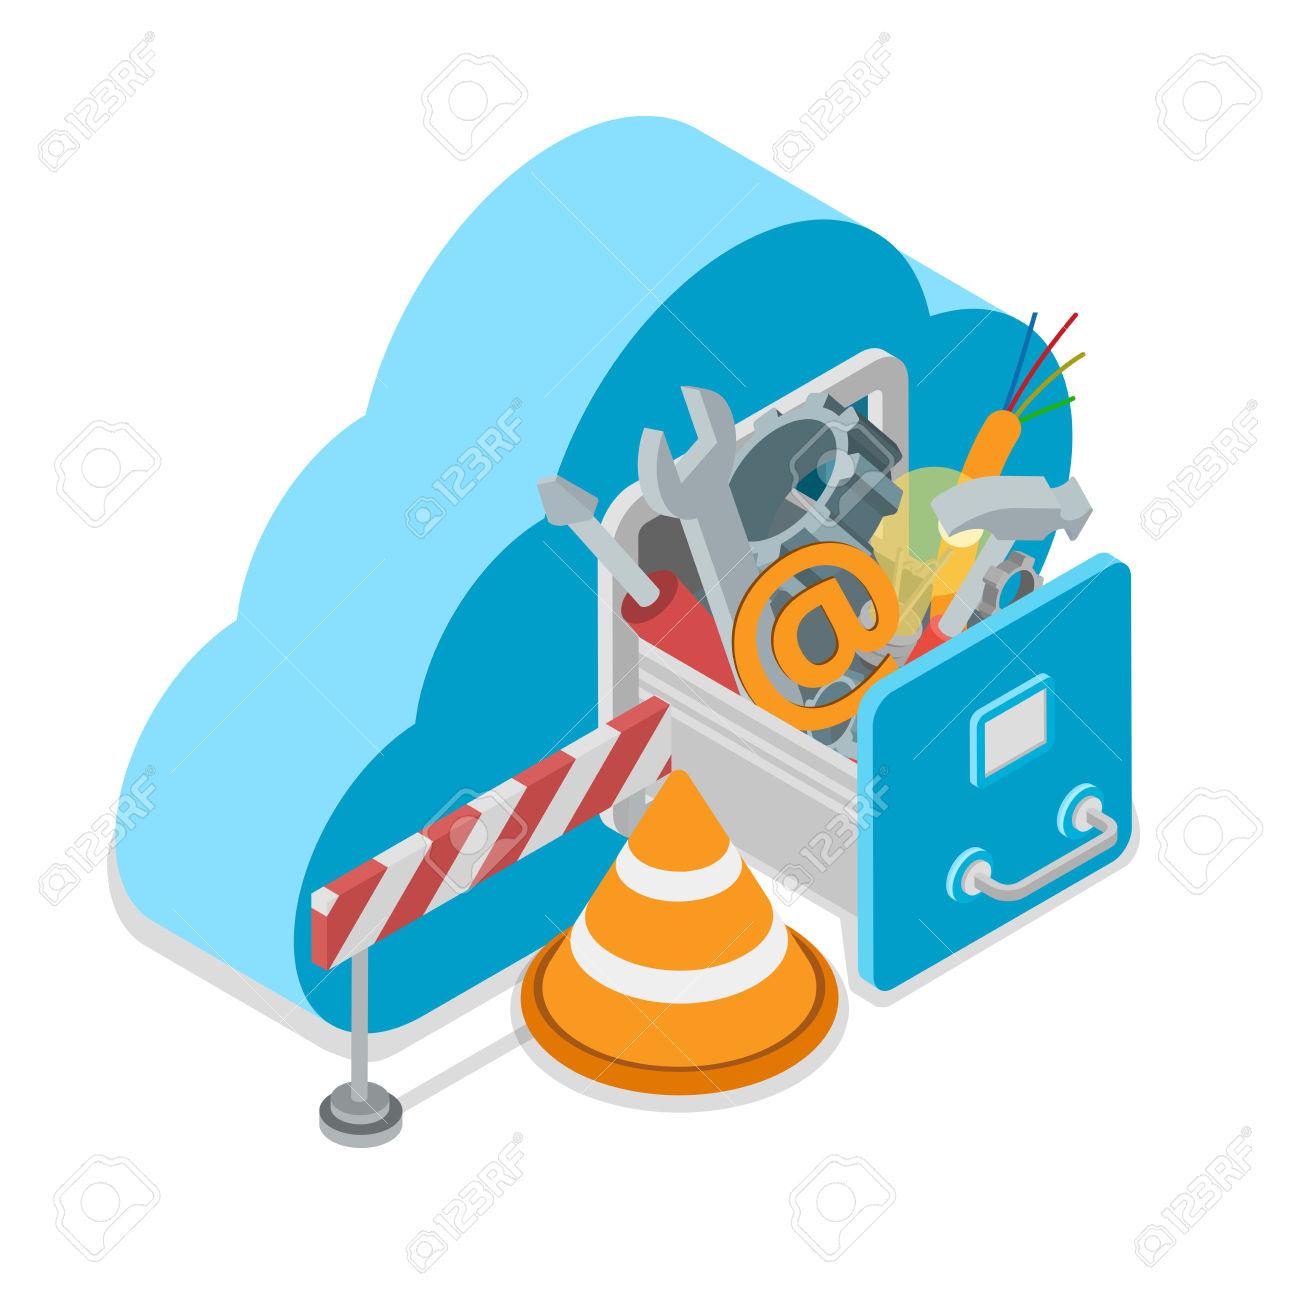 Cloud Service Under Construction. Cloud Shape Drawer Wrench.